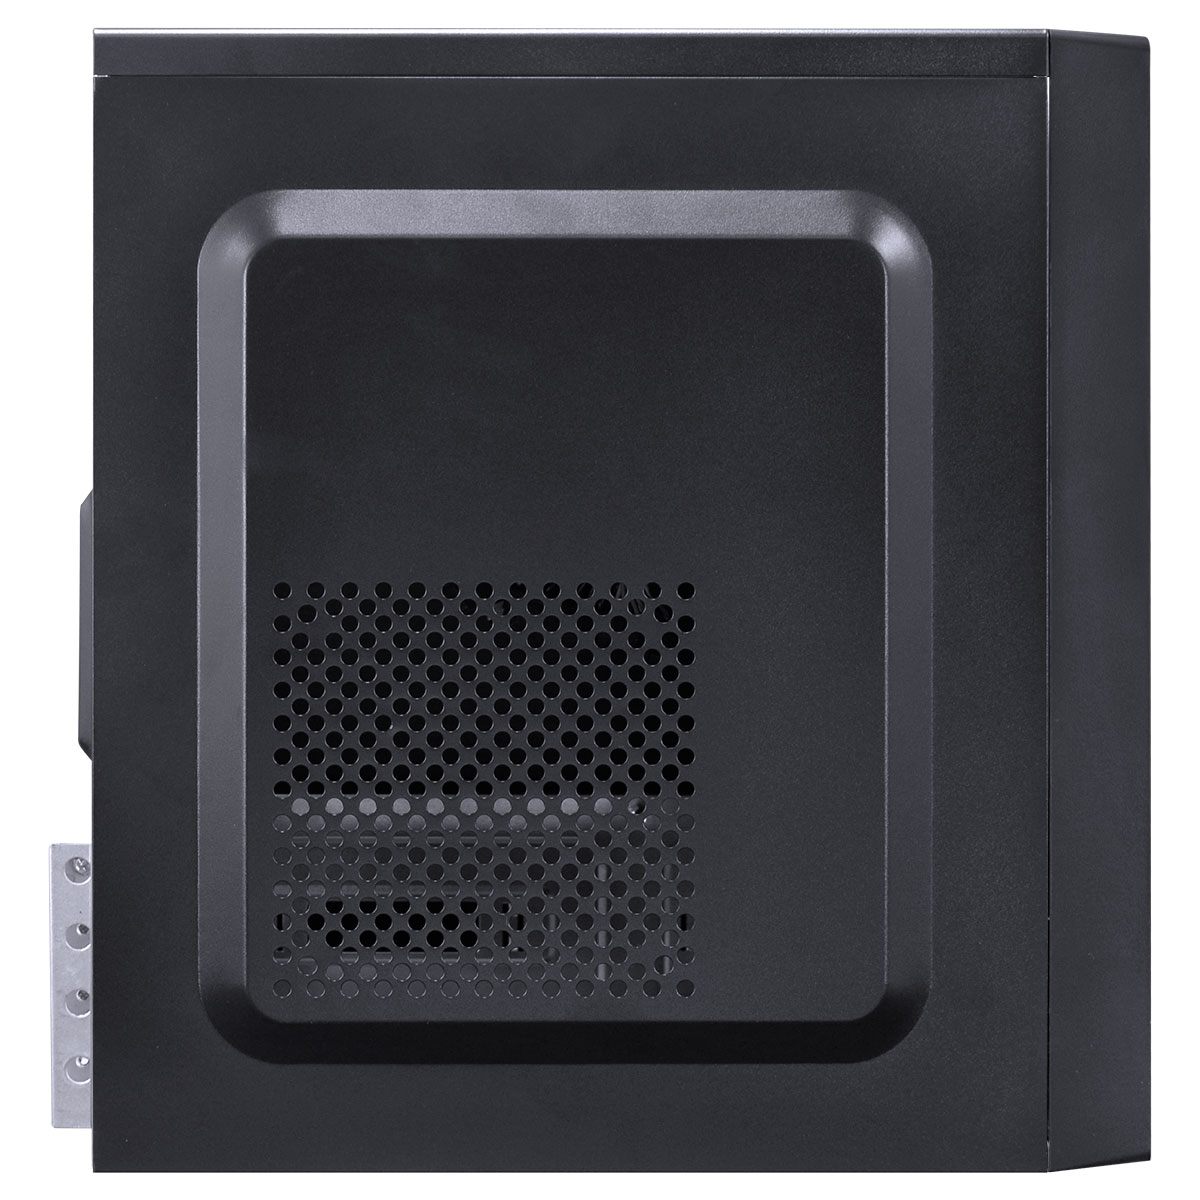 COMPUTADOR HOME H200 - PENTIUM DUAL CORE G5400 3.7GHZ MEM 8GB DDR4 HD 1TB HDMI/VGA FONTE 200W